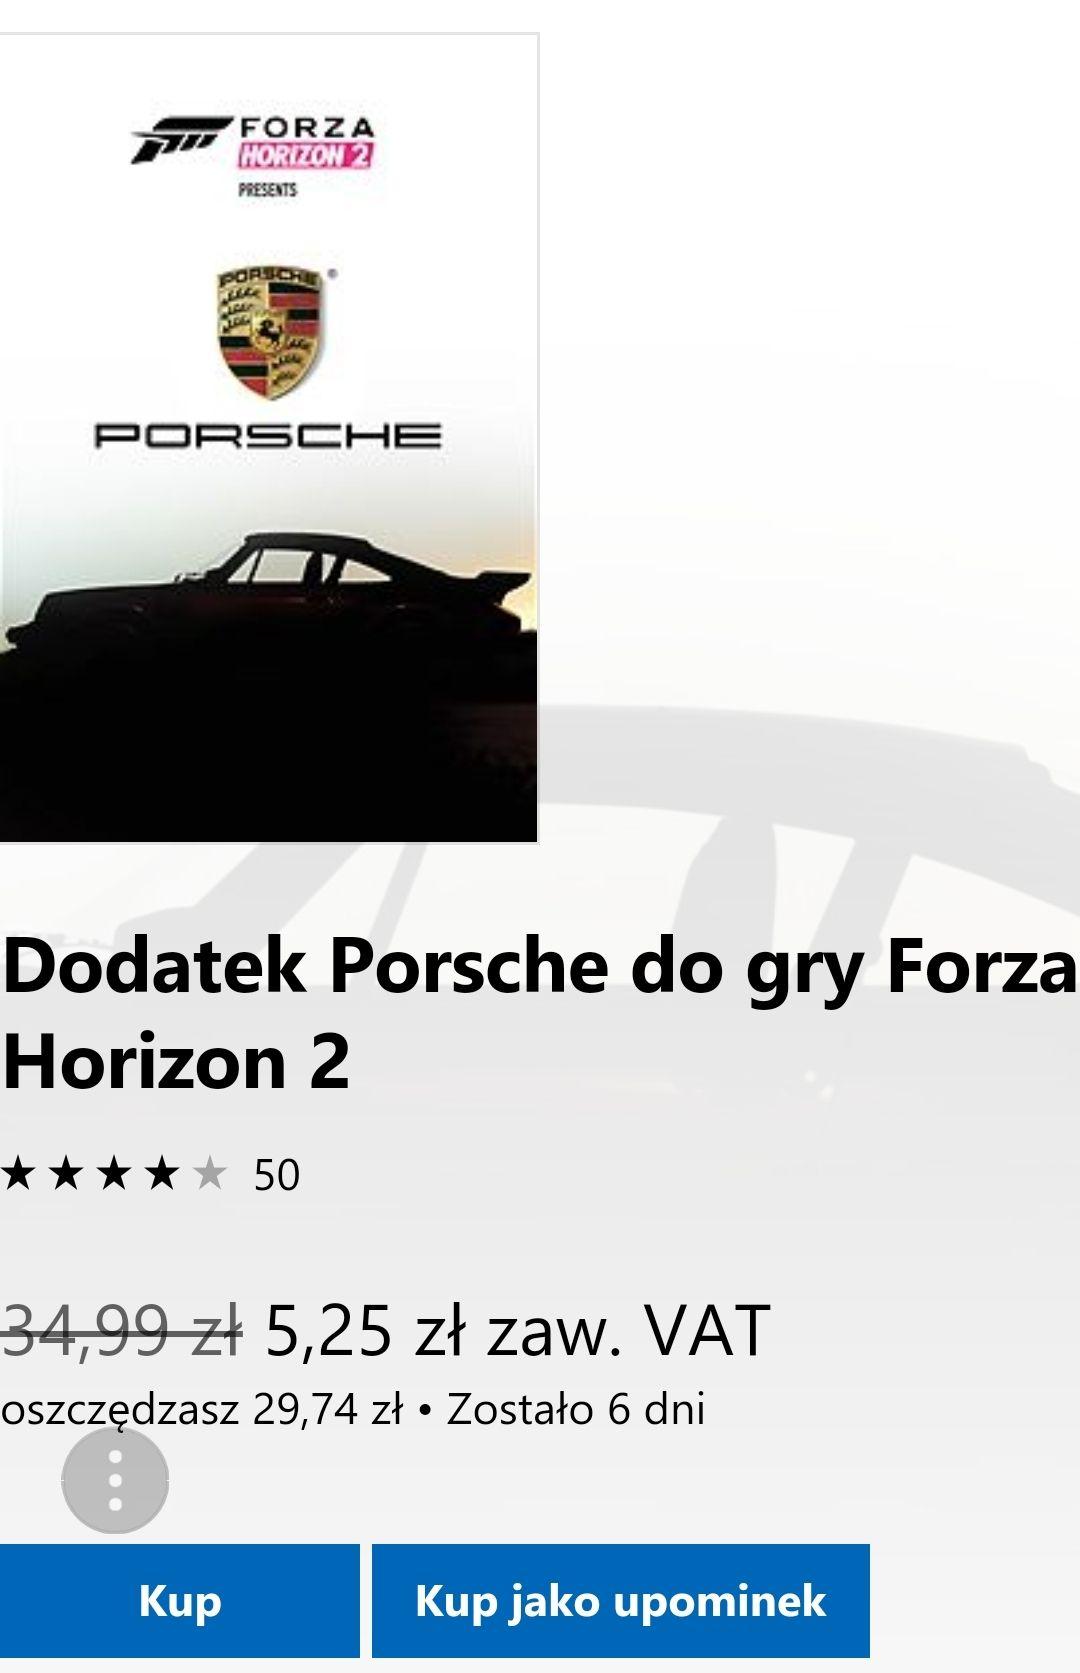 Dodatek Porsche do gry Forza Horizon 2. Xbox one